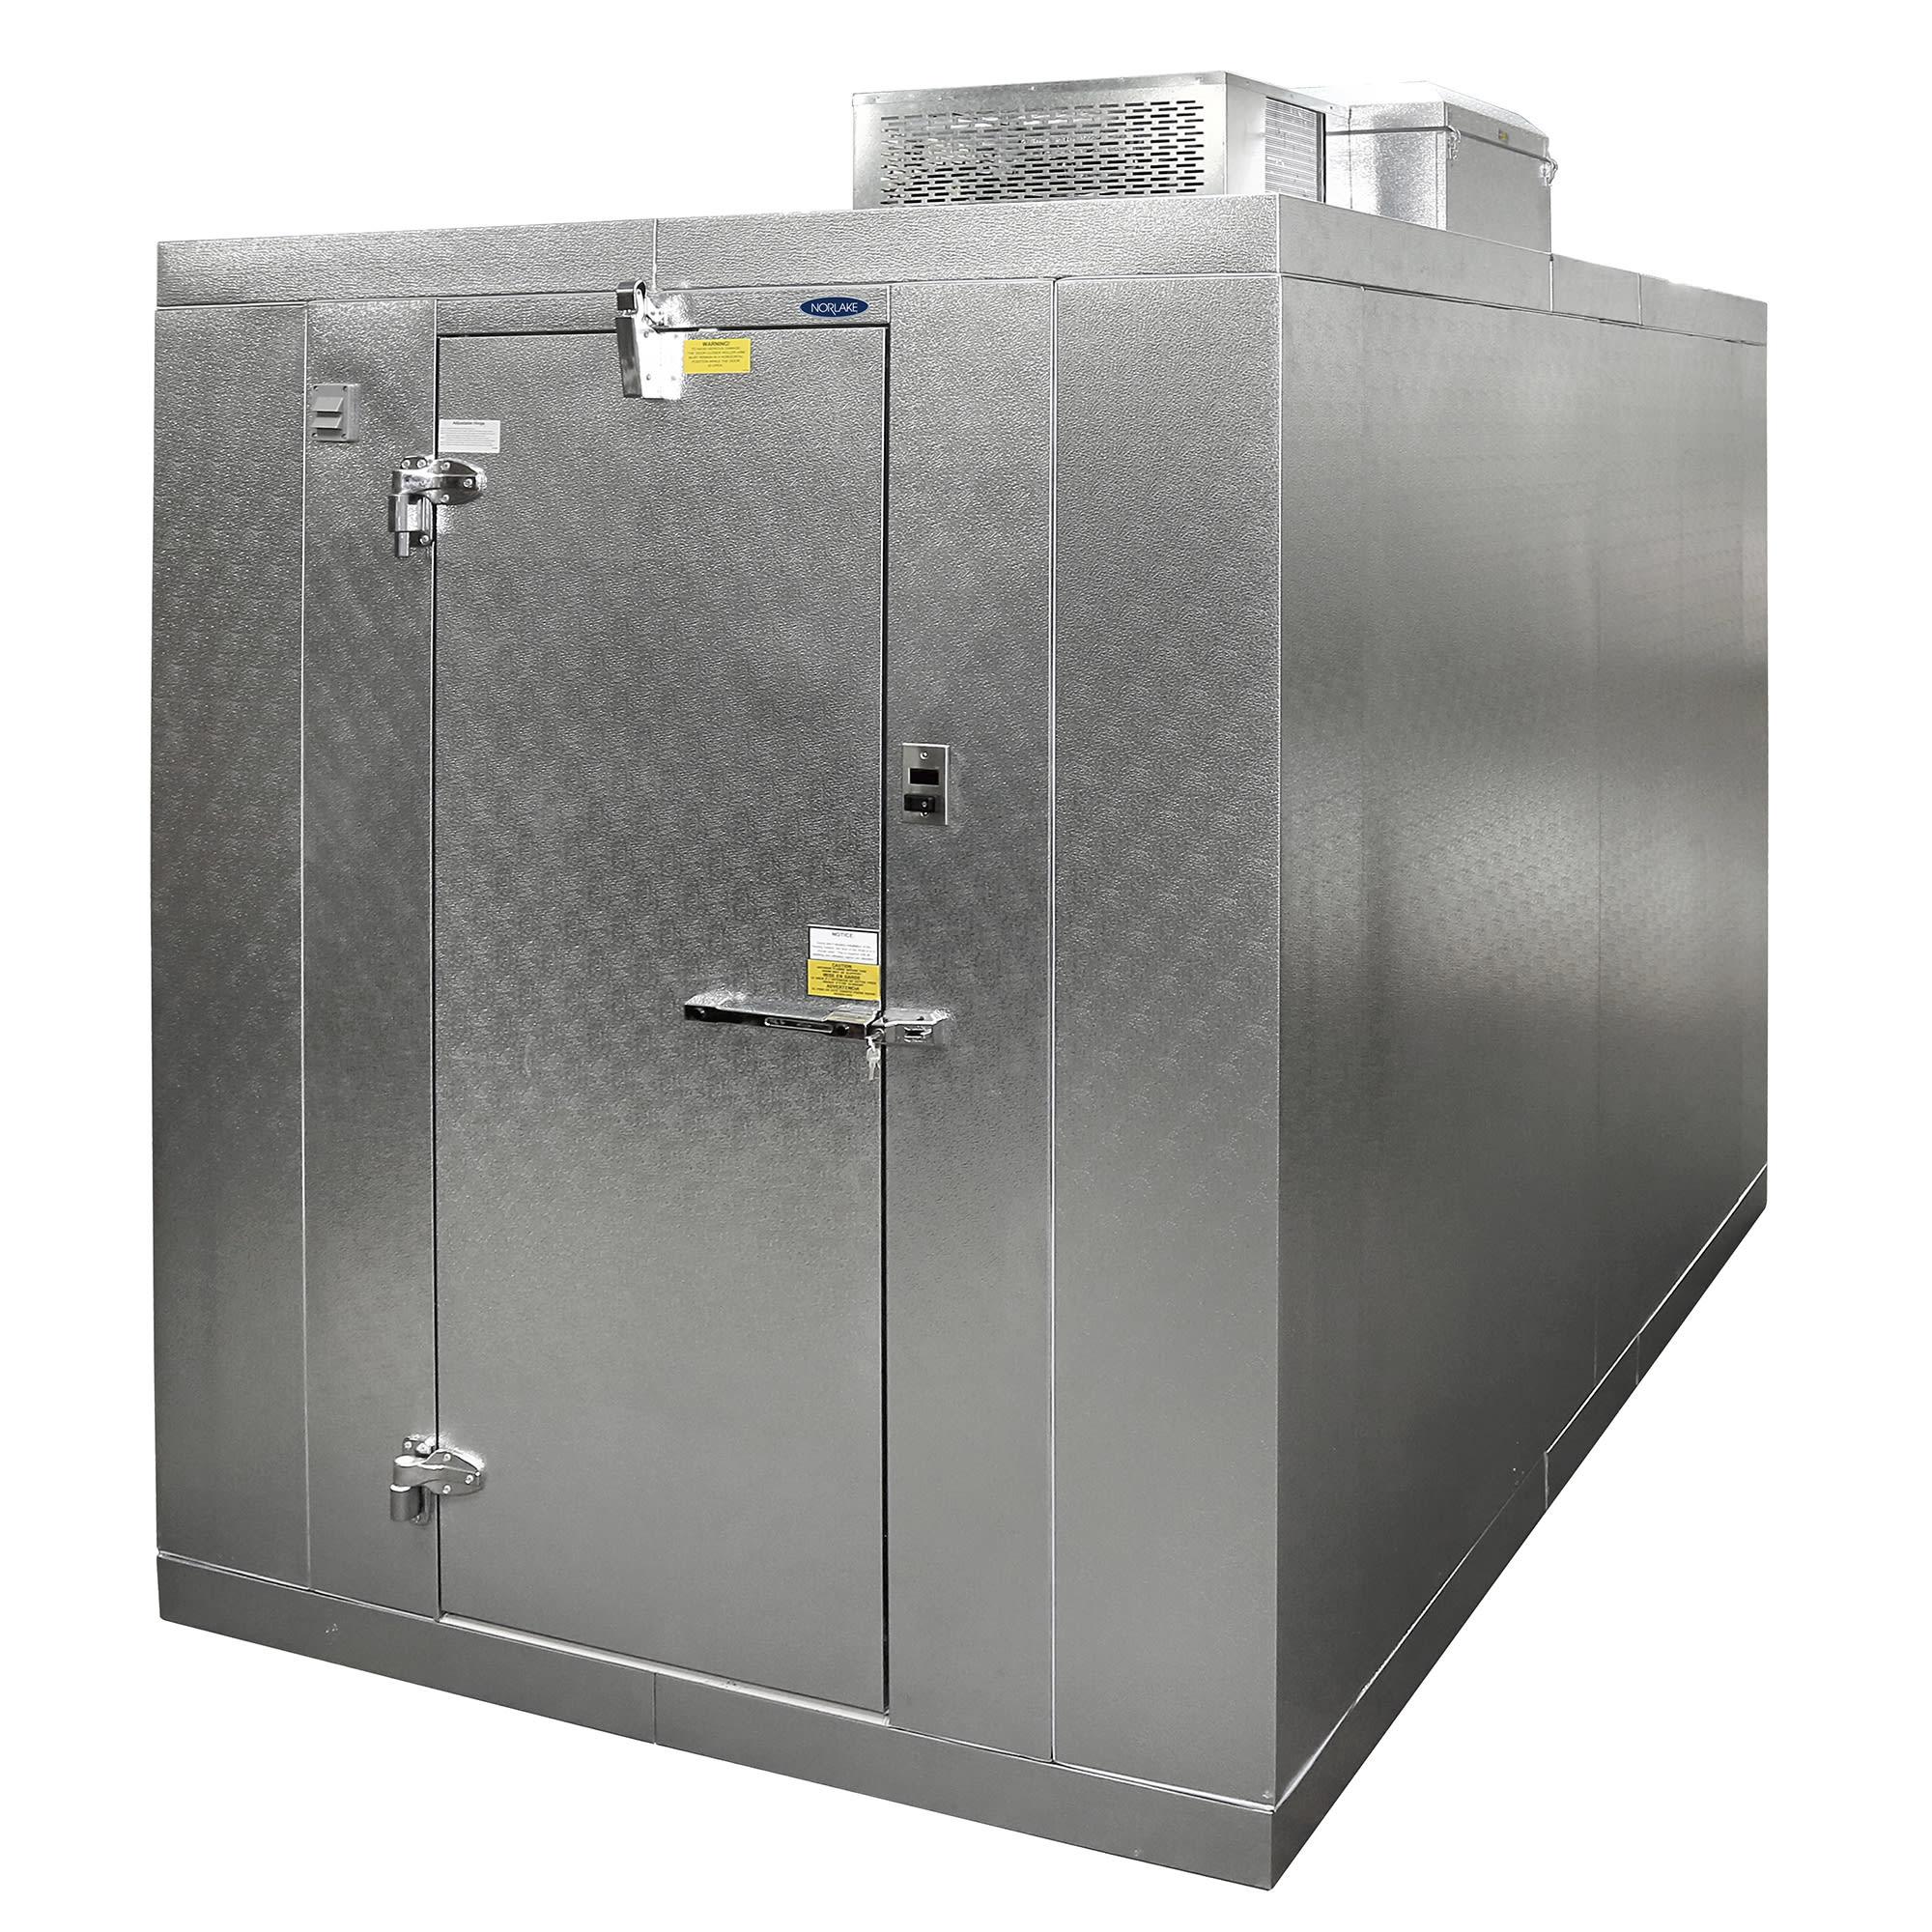 Nor-Lake KLB88-C R Indoor Walk-In Refrigerator w/ Top Mou...